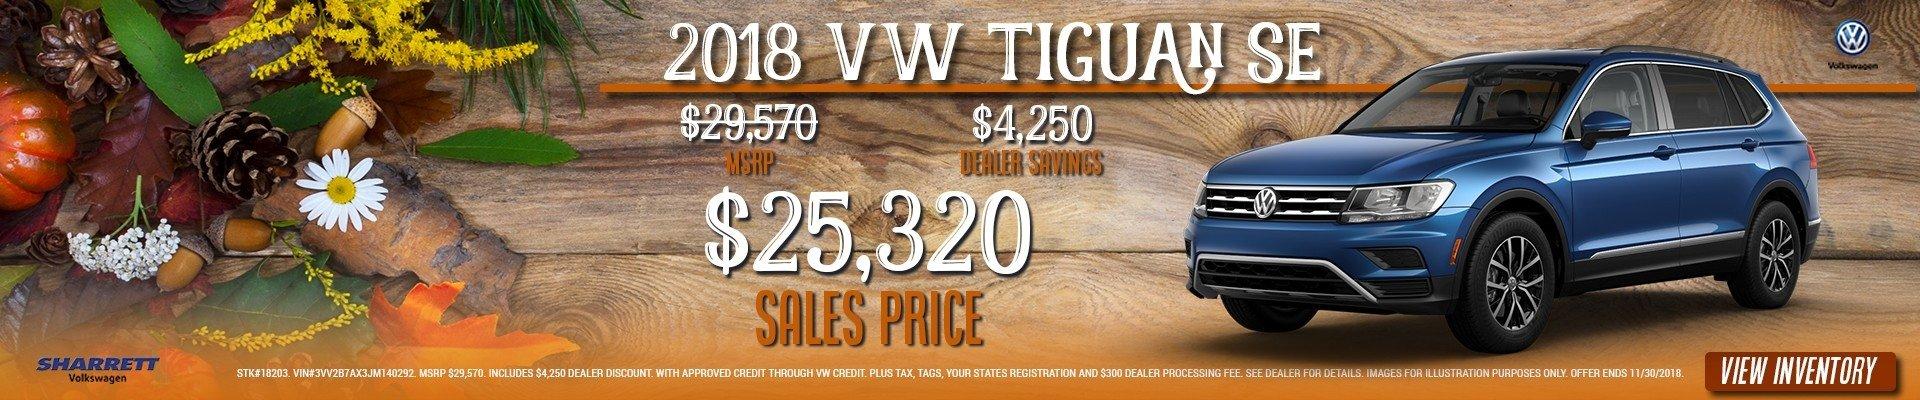 Get $4,250 off a new 2018 VW Tiguan – only $25,320 at Sharrett Volkswagen